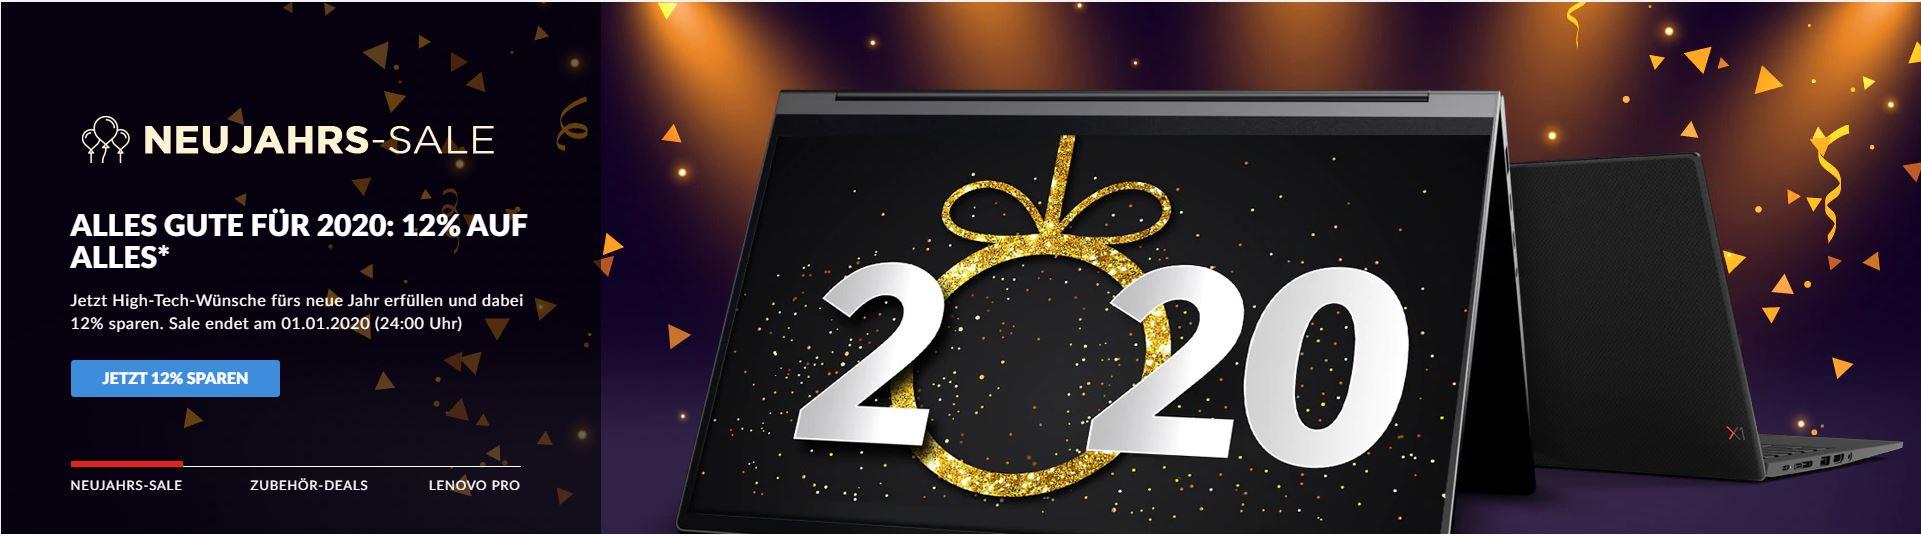 Lenovo 12% Neujahrs-Sale auf Alles*